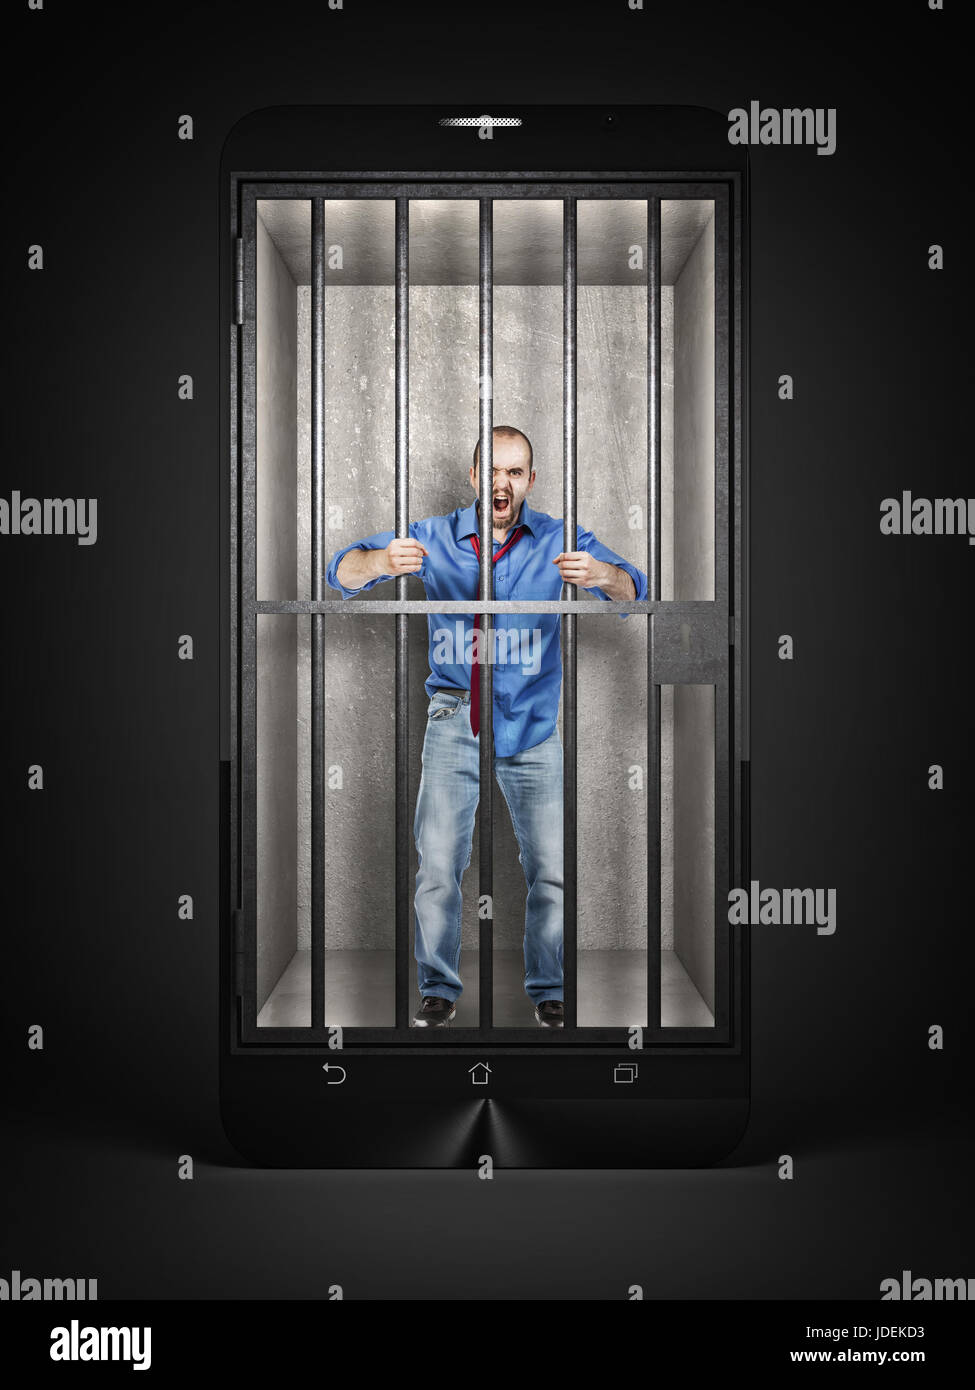 man imprisoned in a methaphoric smartphone jail 3d rendering image - Stock Image